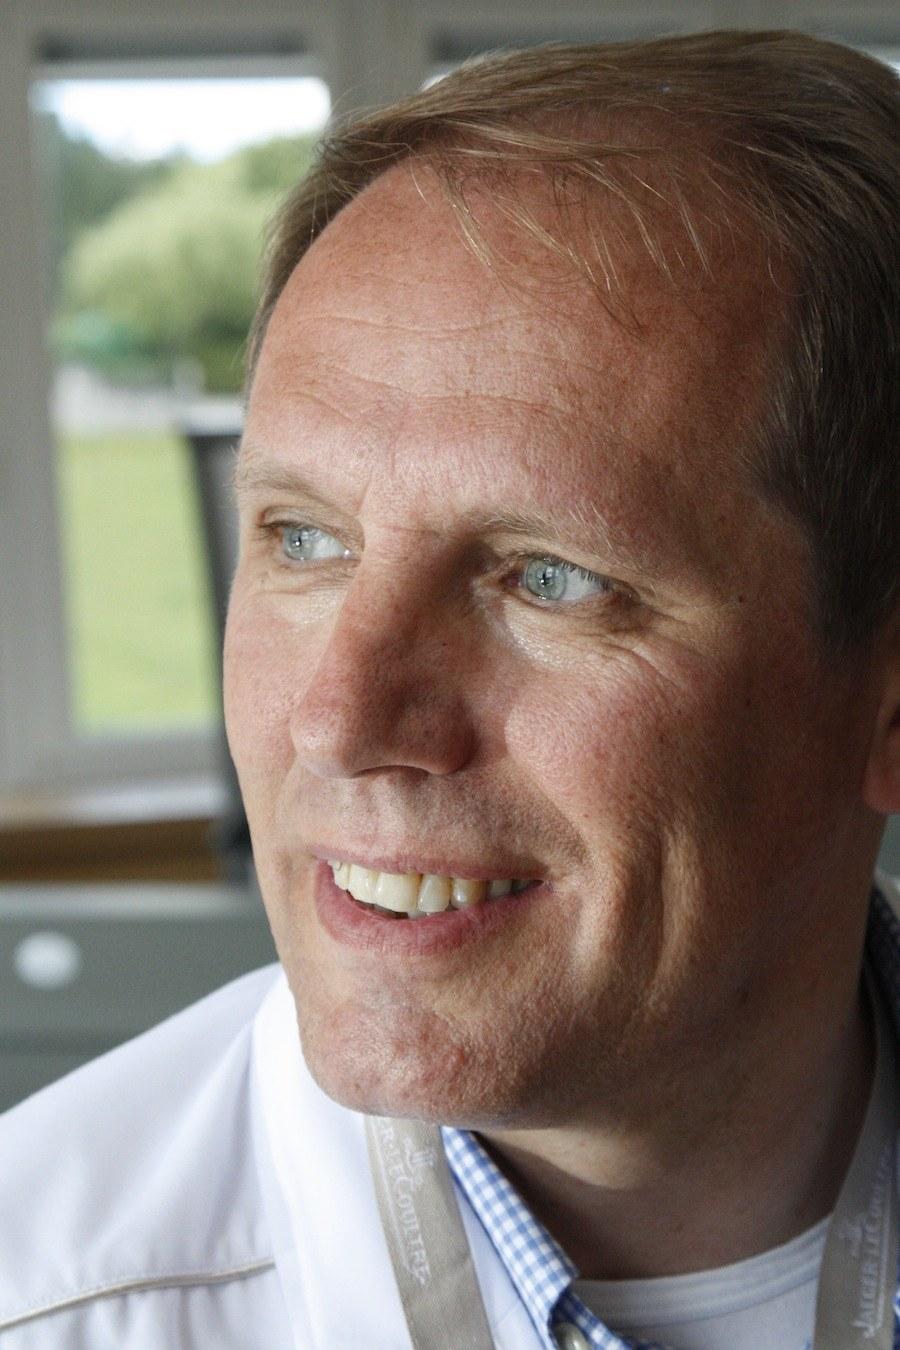 Thorsten Wiehe